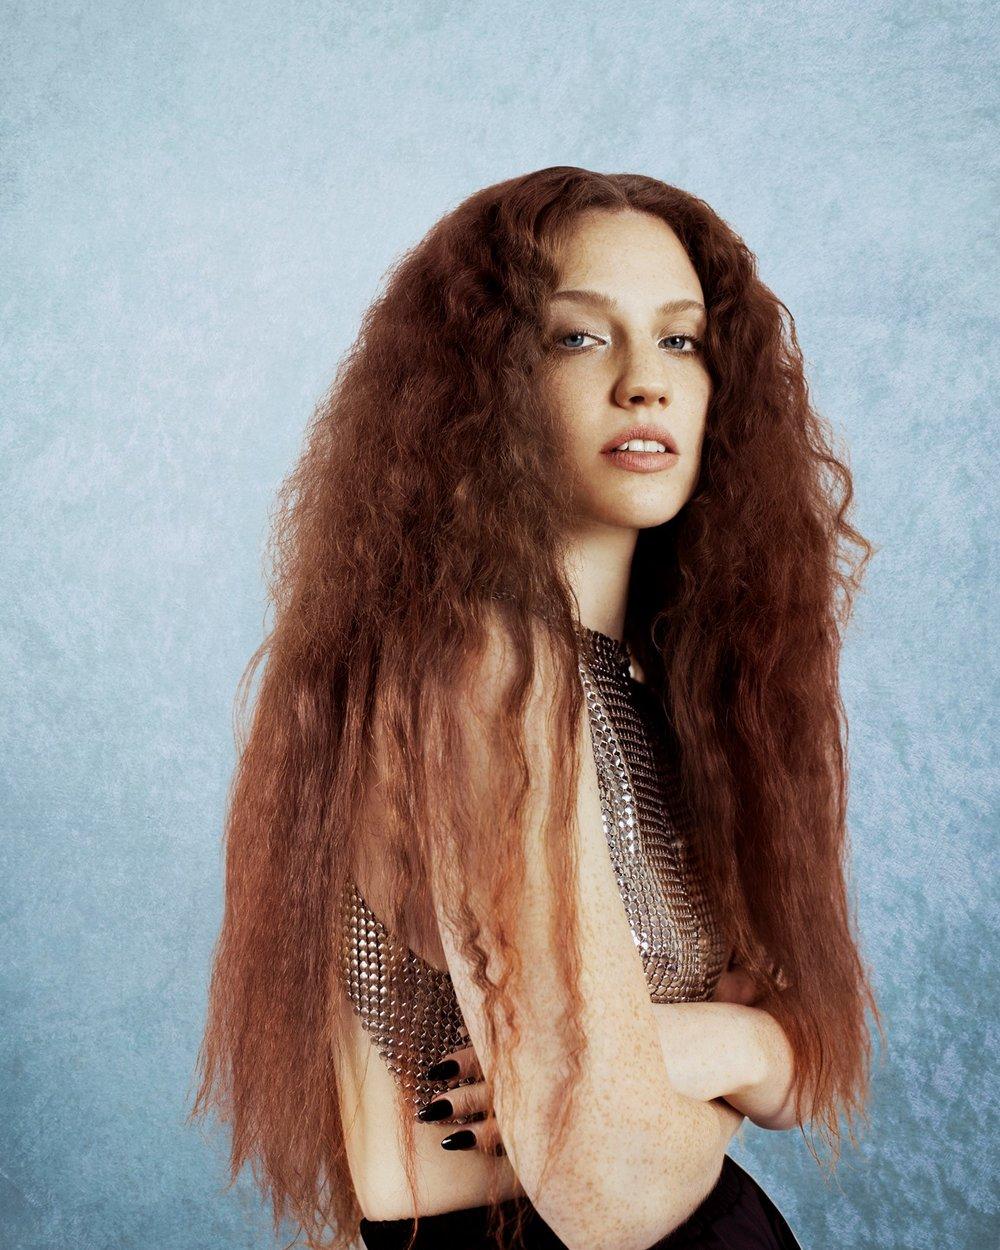 Photo by Nadine Ijewere, Courtesy of Atlantic Records